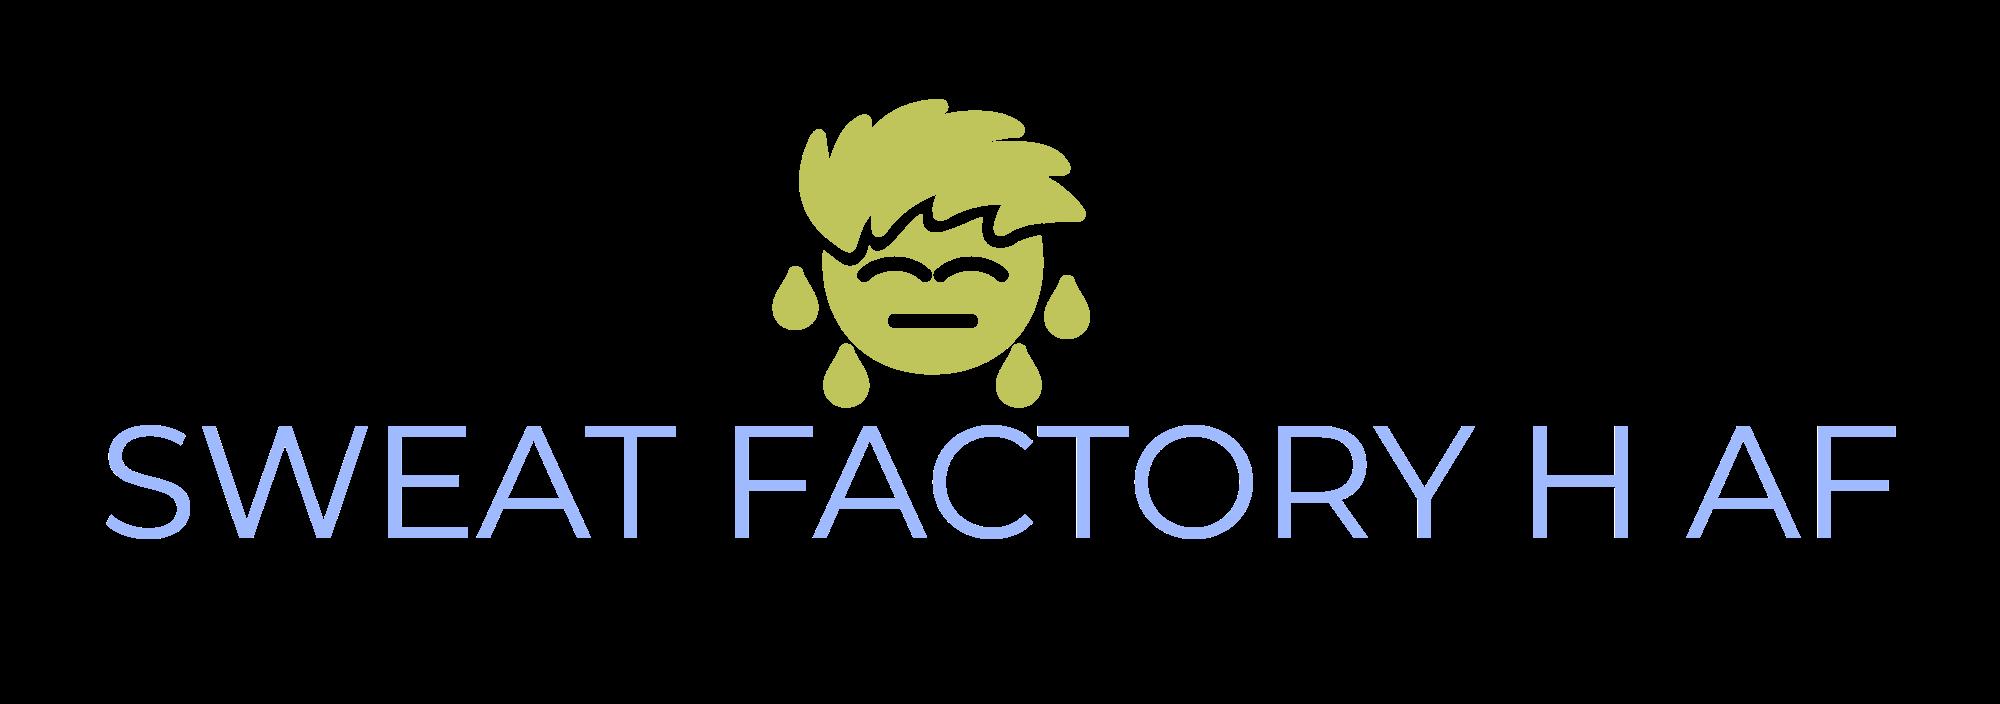 Copy of Copy of SWEAT FACTORY H AF